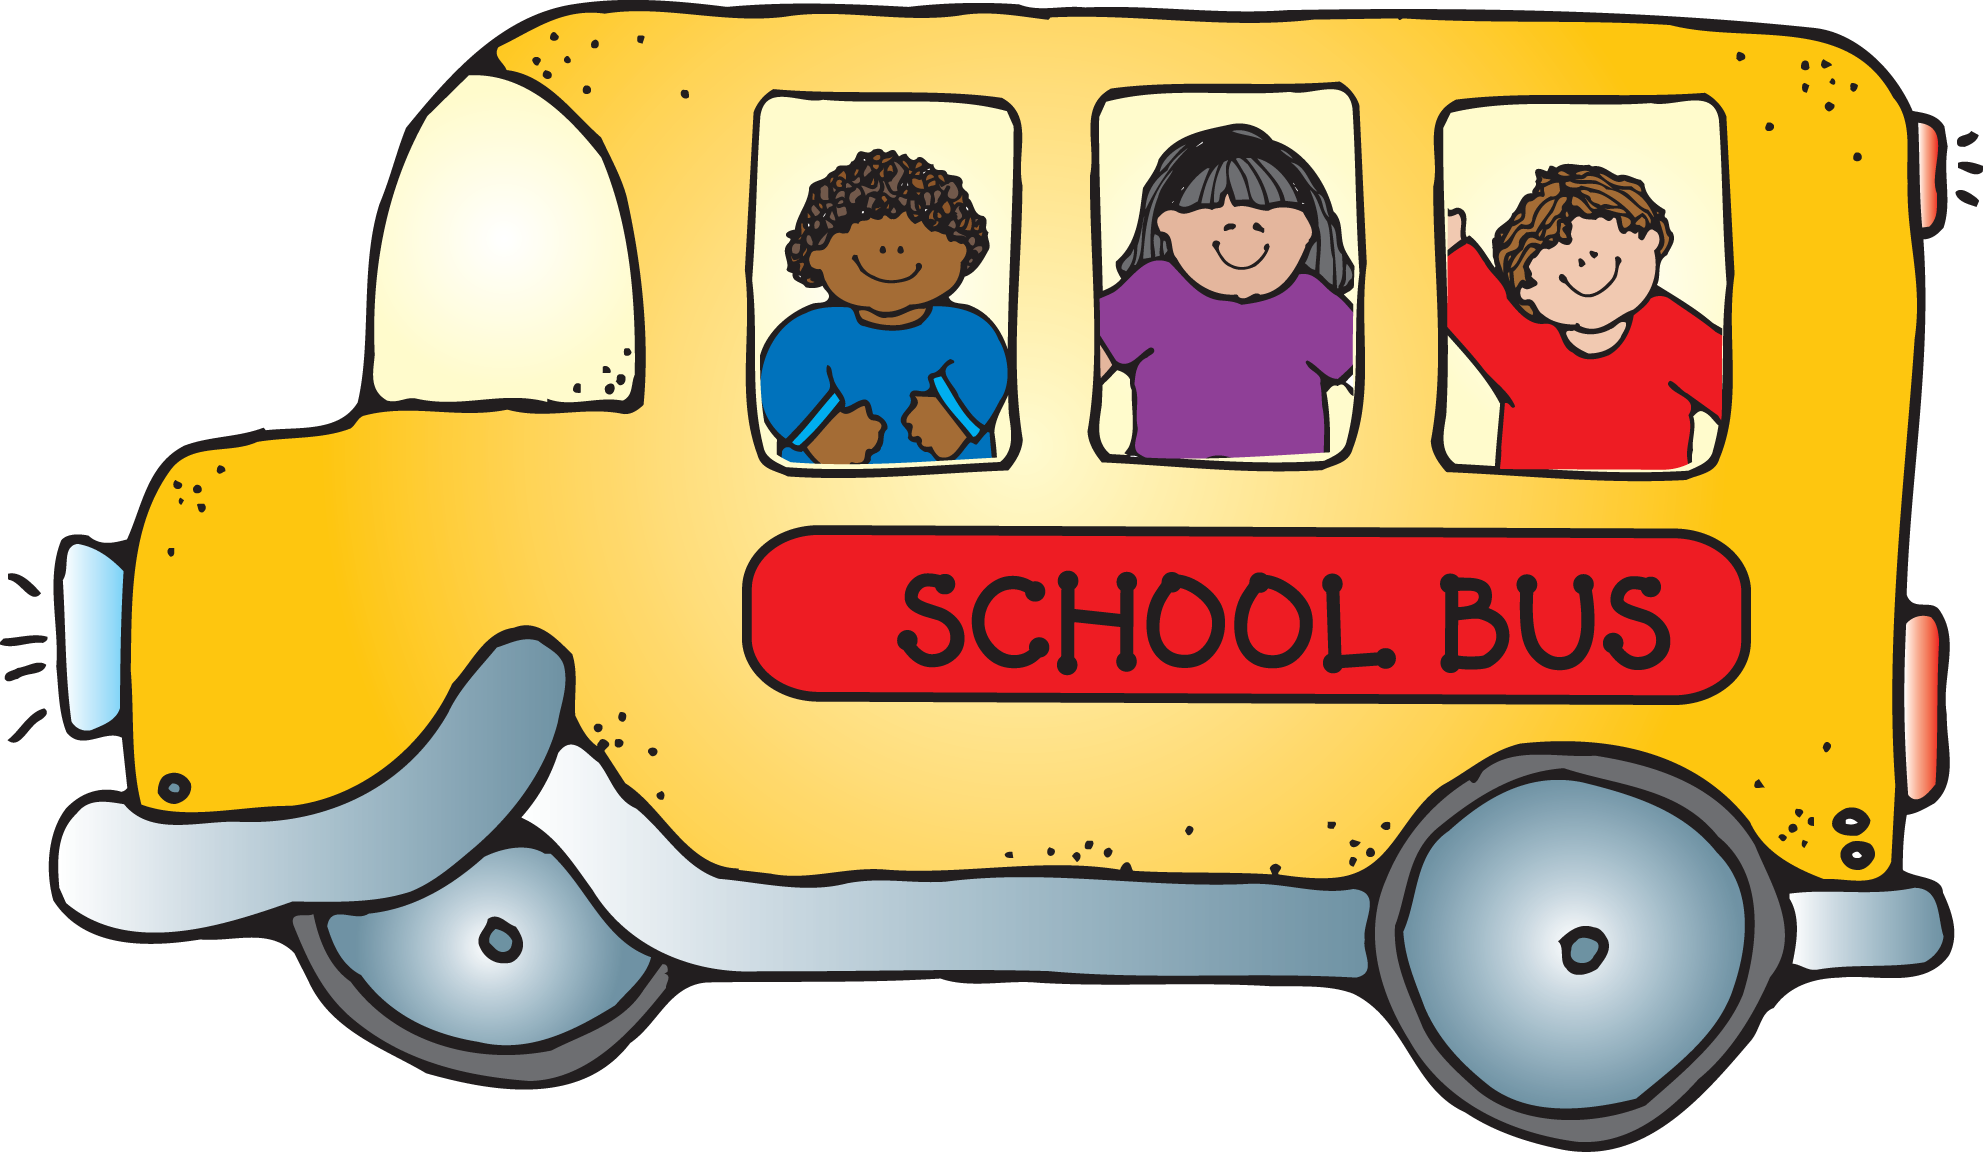 Minivan clipart cute. School bus children png